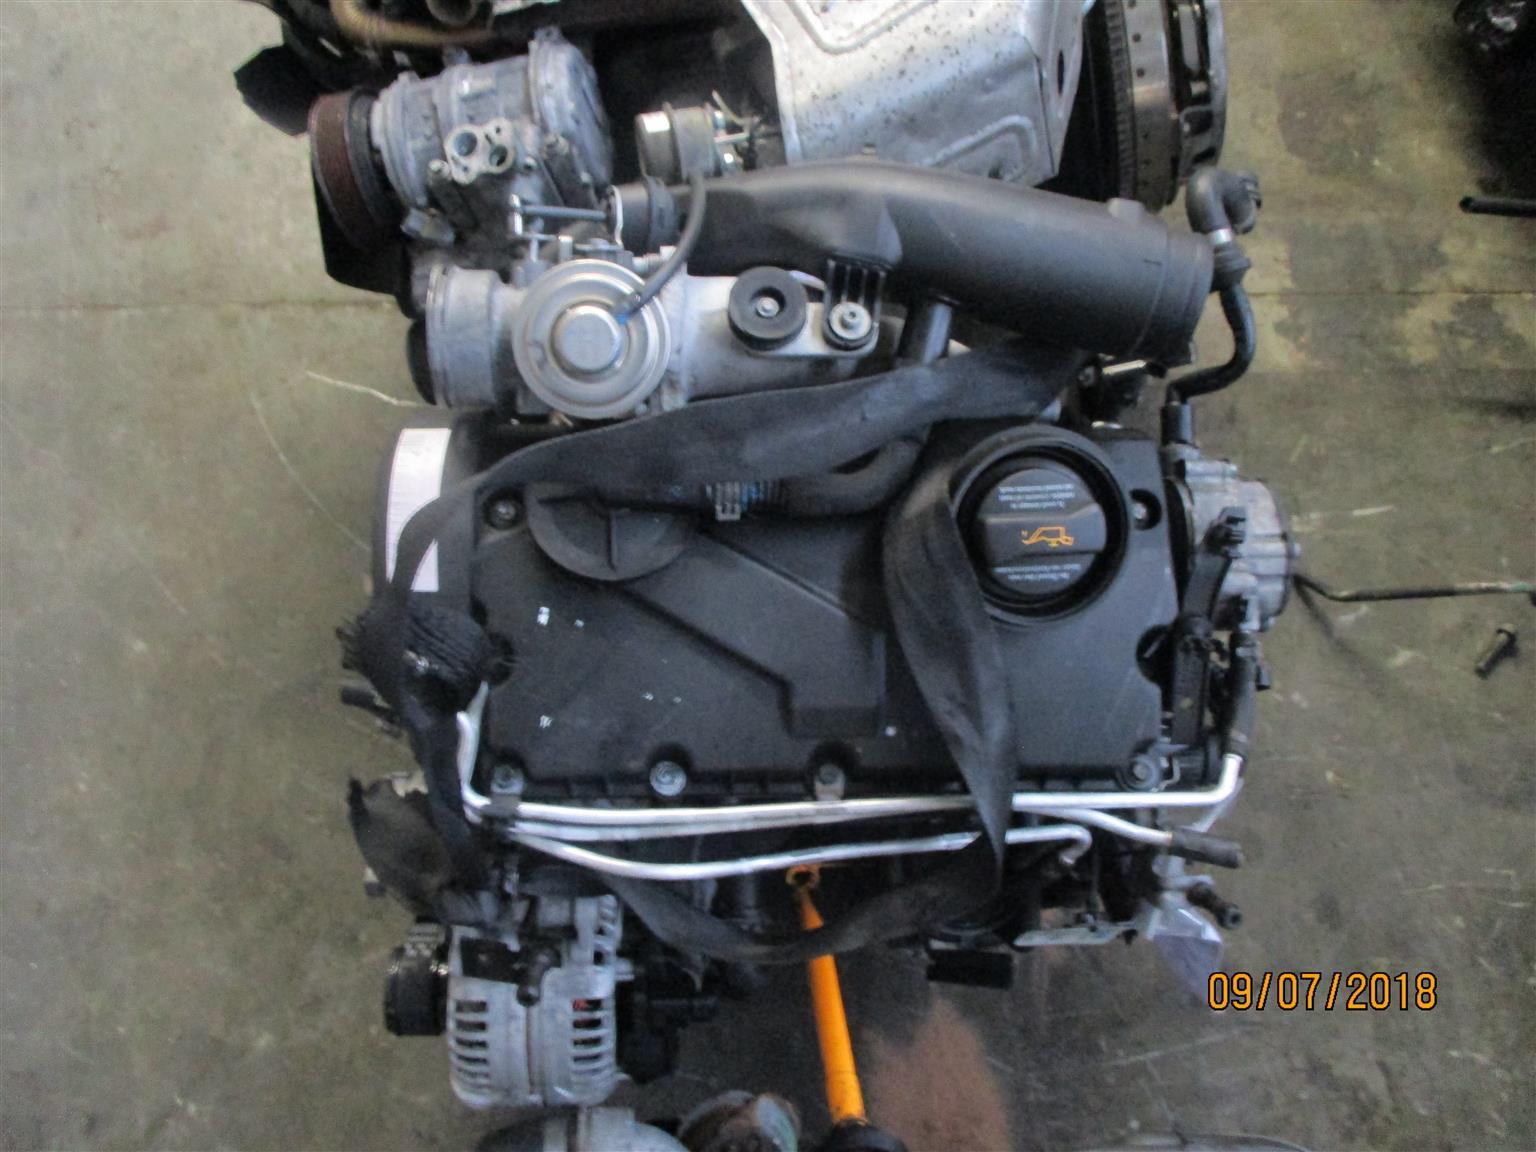 Vw Engines For Sale >> Vw Caddy 1 9tdi Bjb Engine For Sale